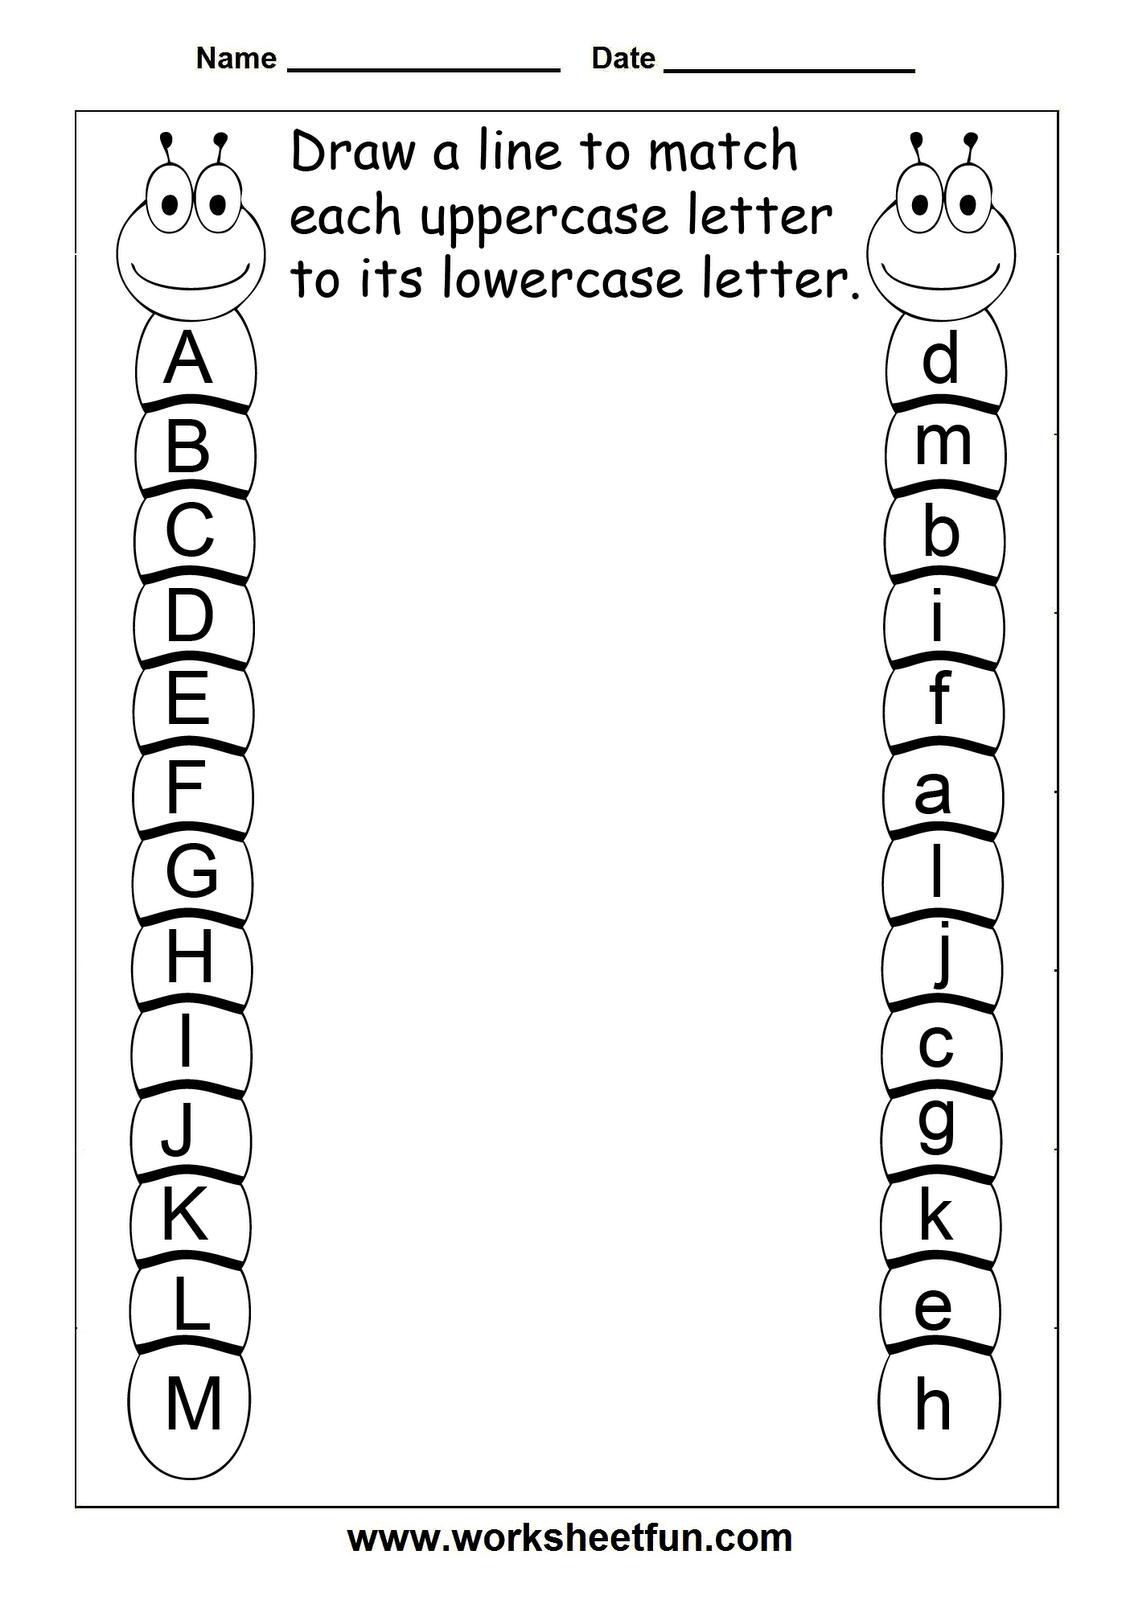 Pinashley Hibbs On Kiddo | Preschool Worksheets, Kindergarten - Free Printable Alphabet Worksheets For Grade 1